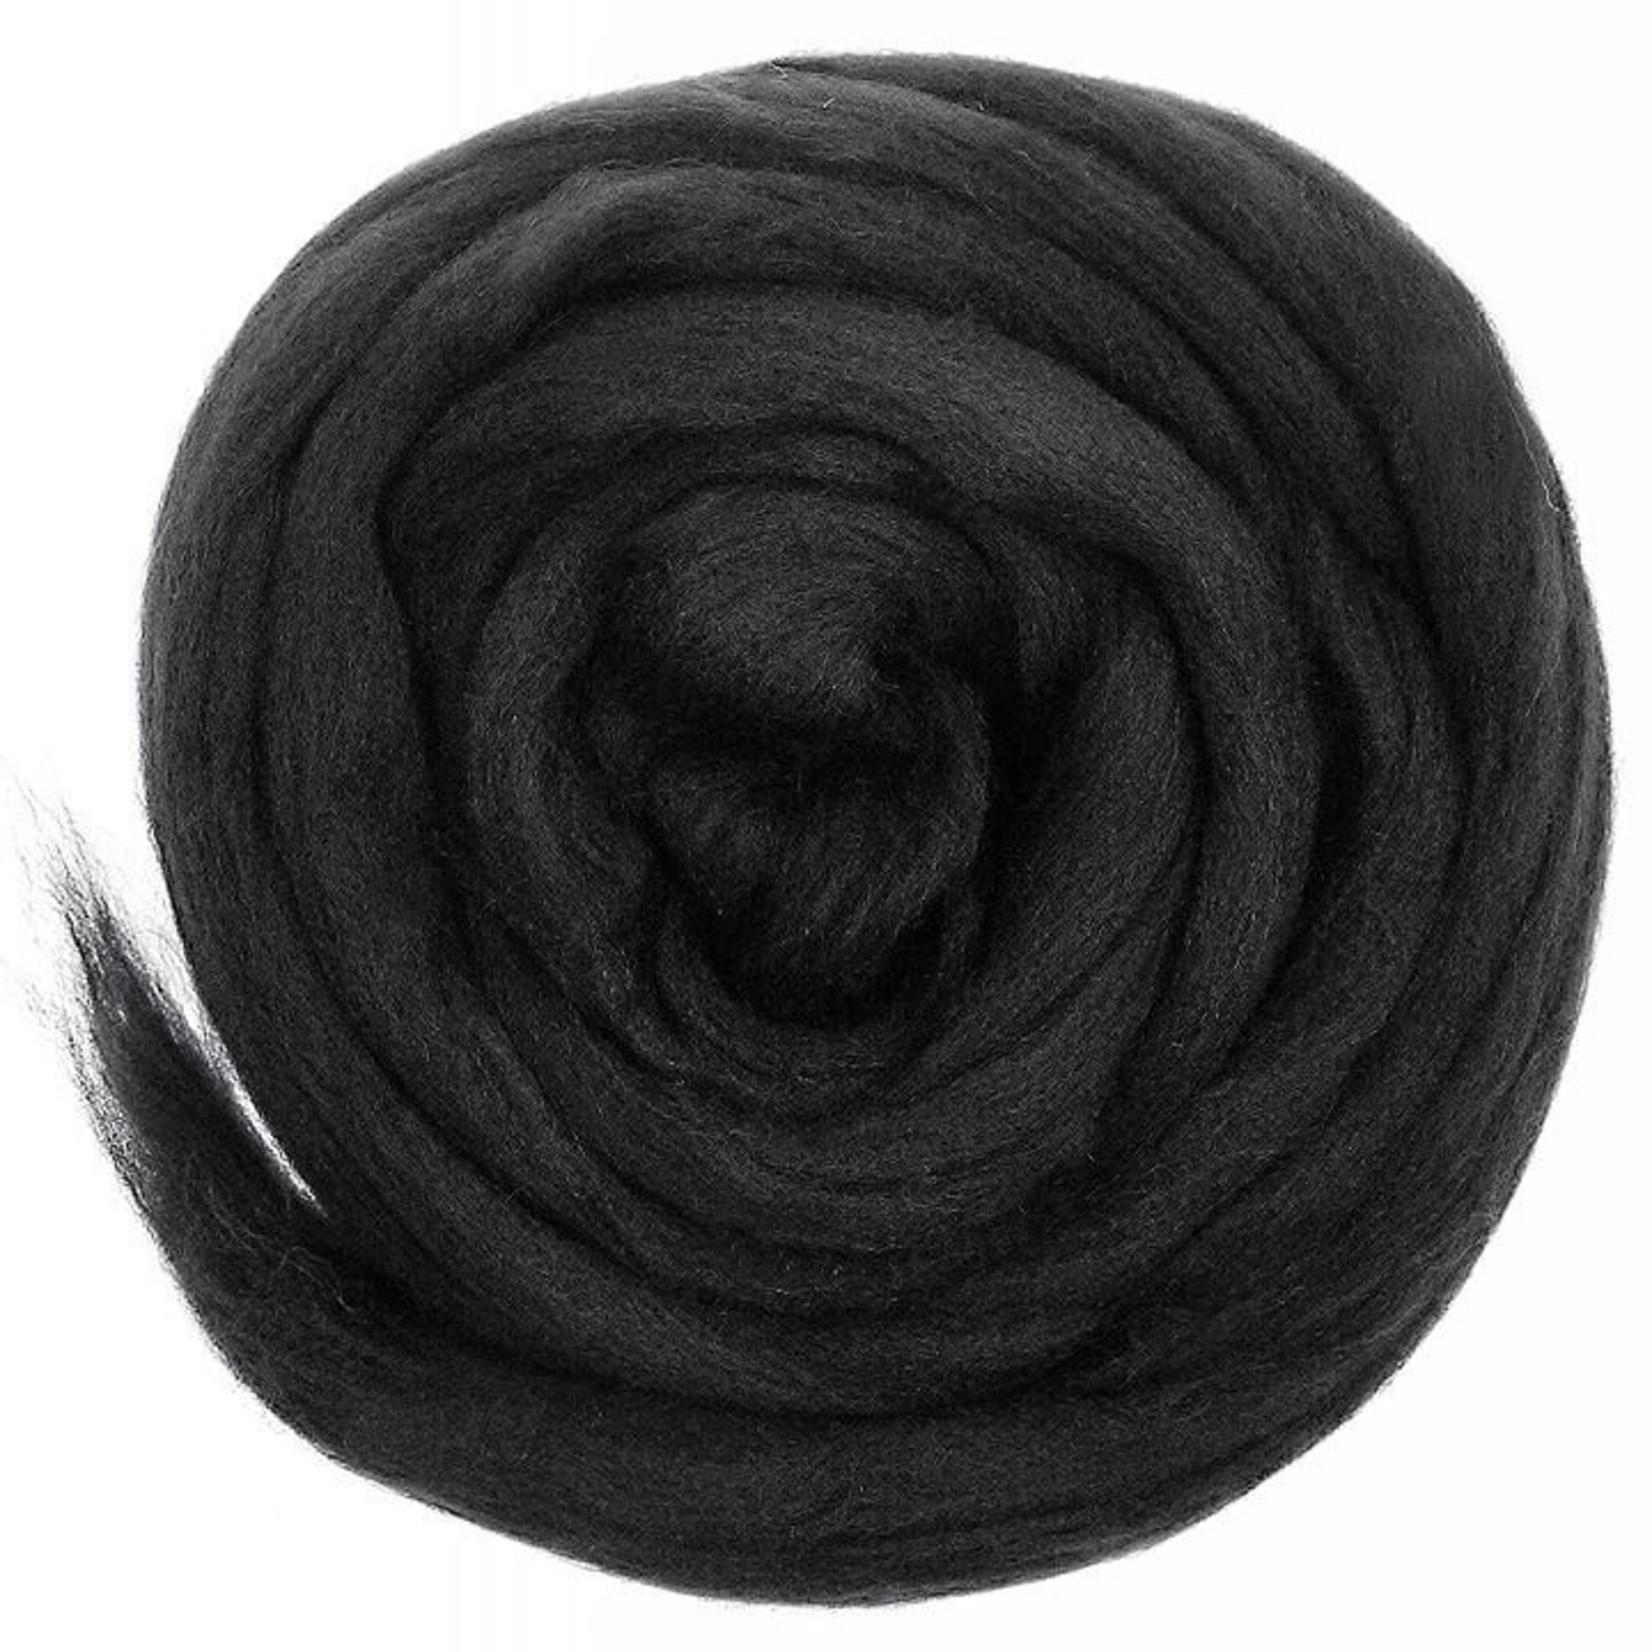 Meervilt Lontwol Merino EU - 633 Charcoal Black - 50 gr.